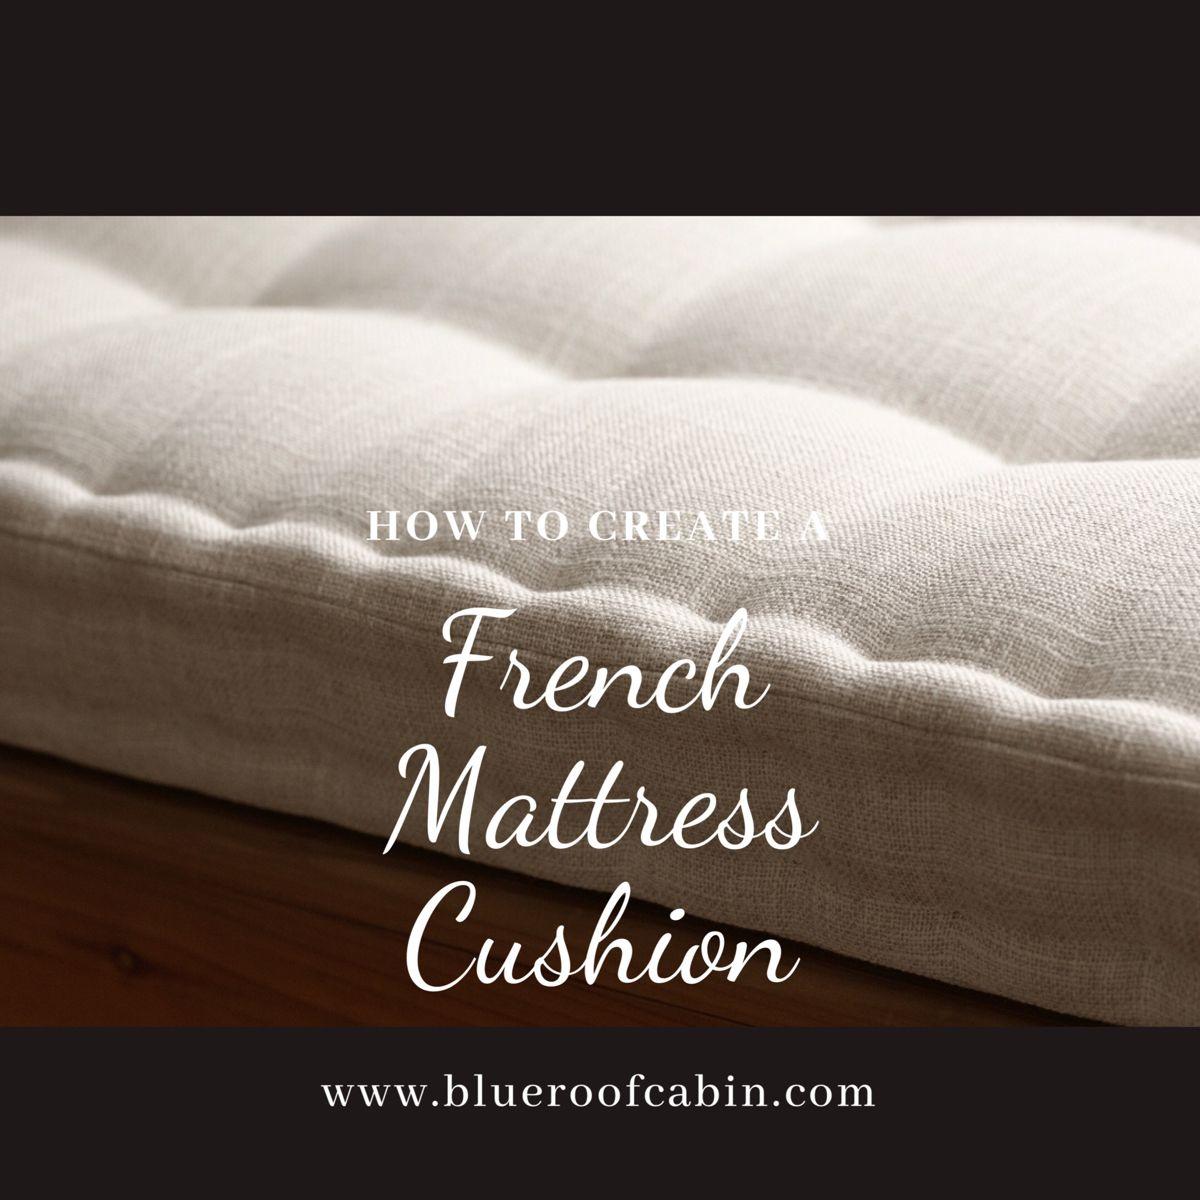 How To Create French Mattress Cushion Youtube In 2020 Mattress Cushion French Mattress Cushion French Mattress